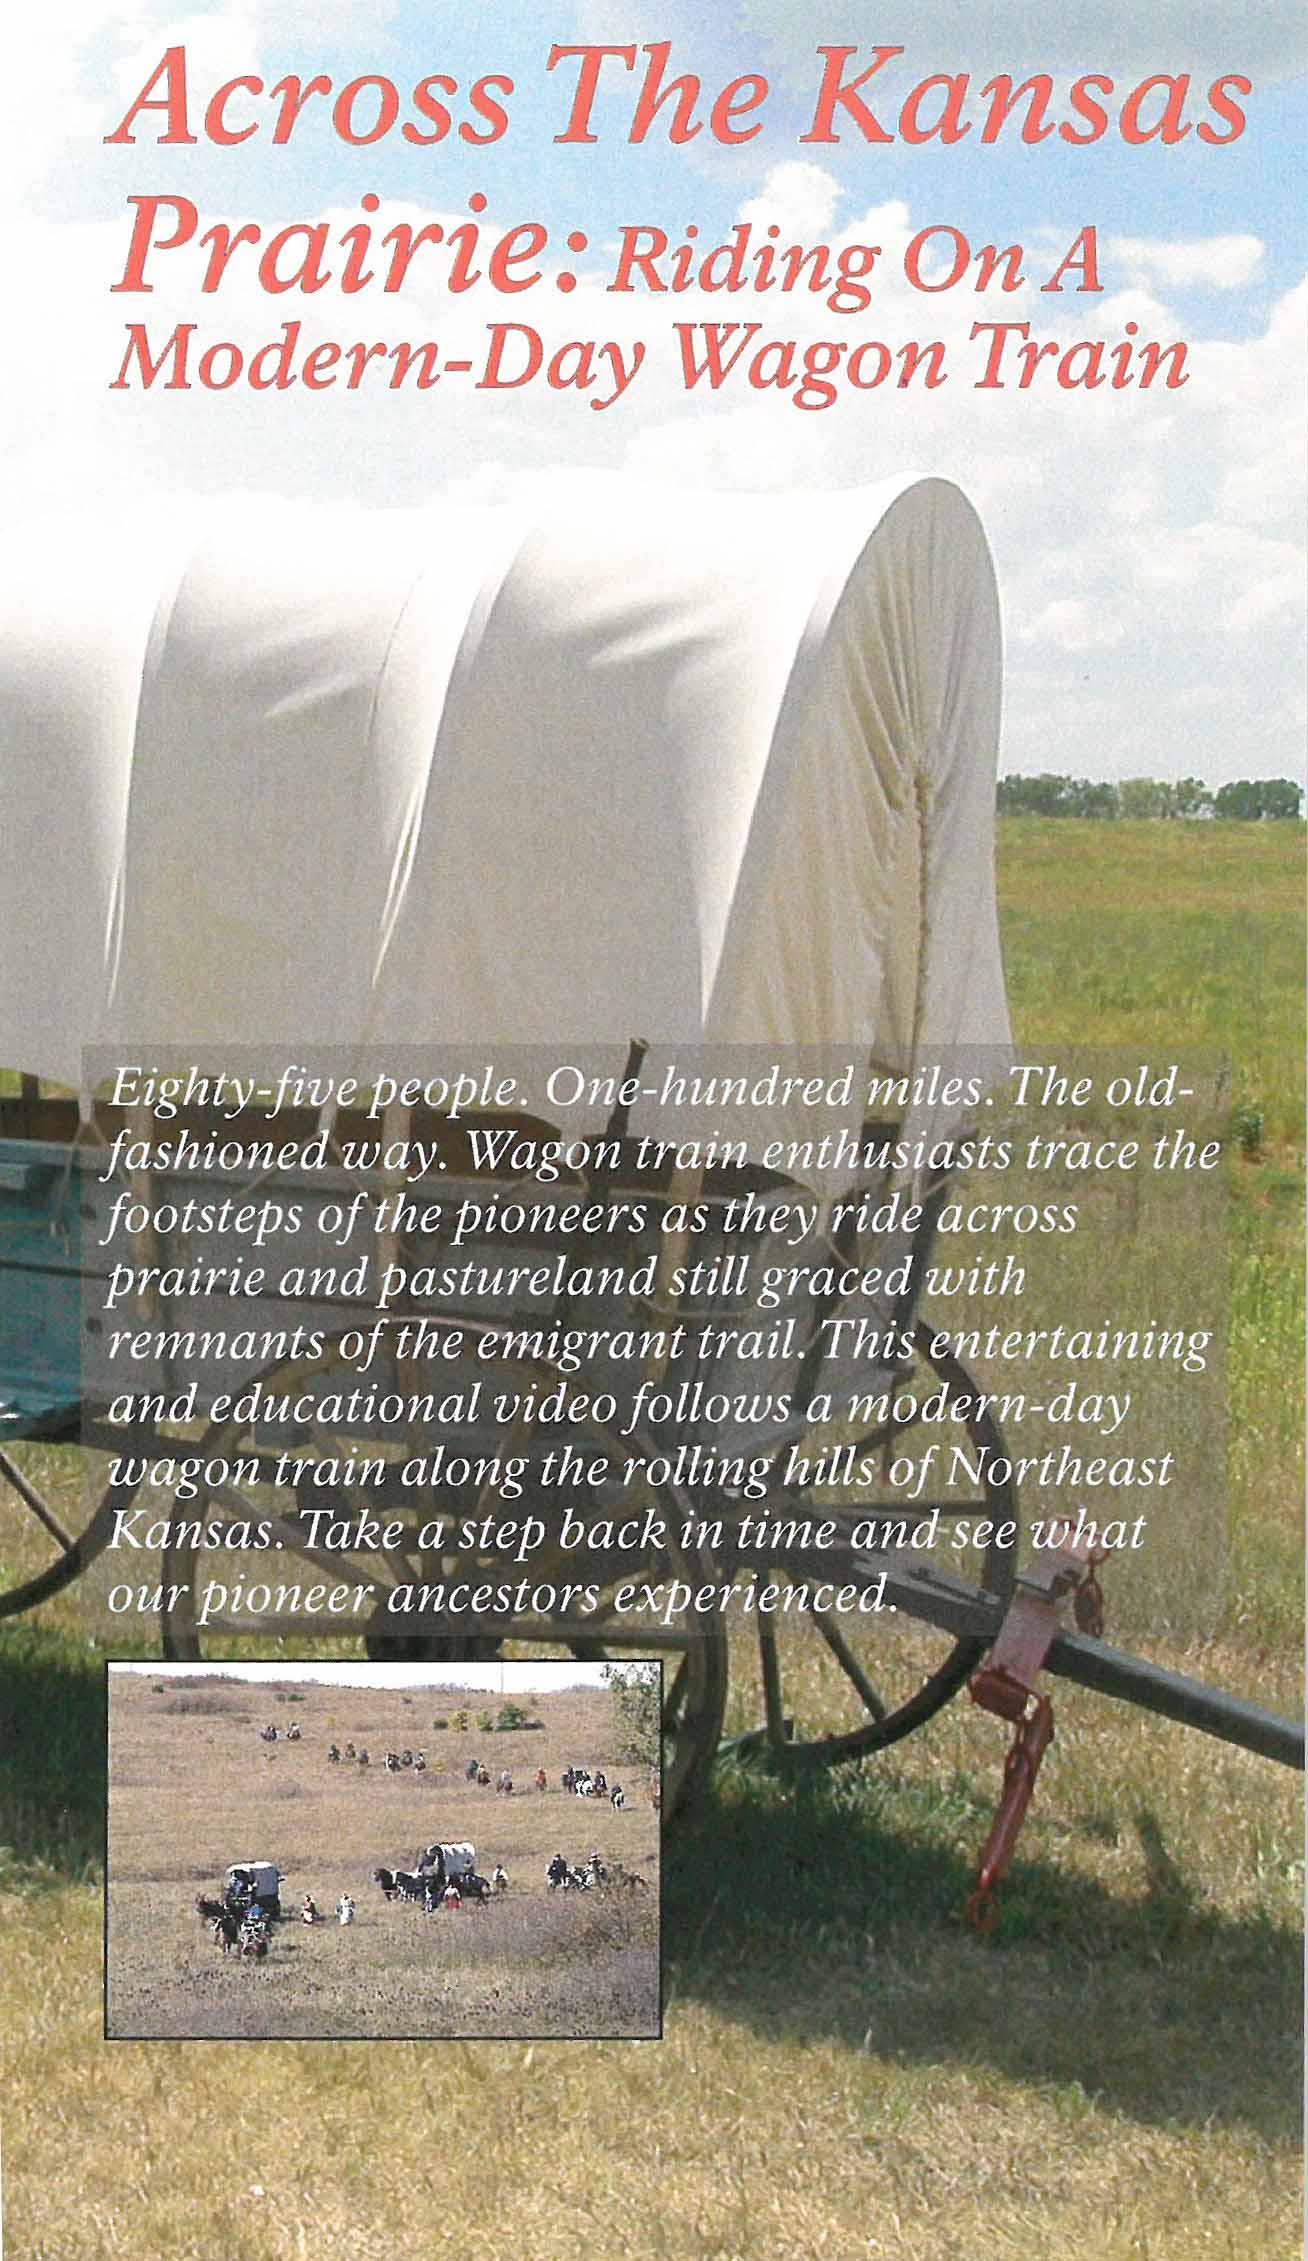 Across the Kansas Prairie: Riding on a Modern-Day Wagon Train (VHS Video) -  OCTA